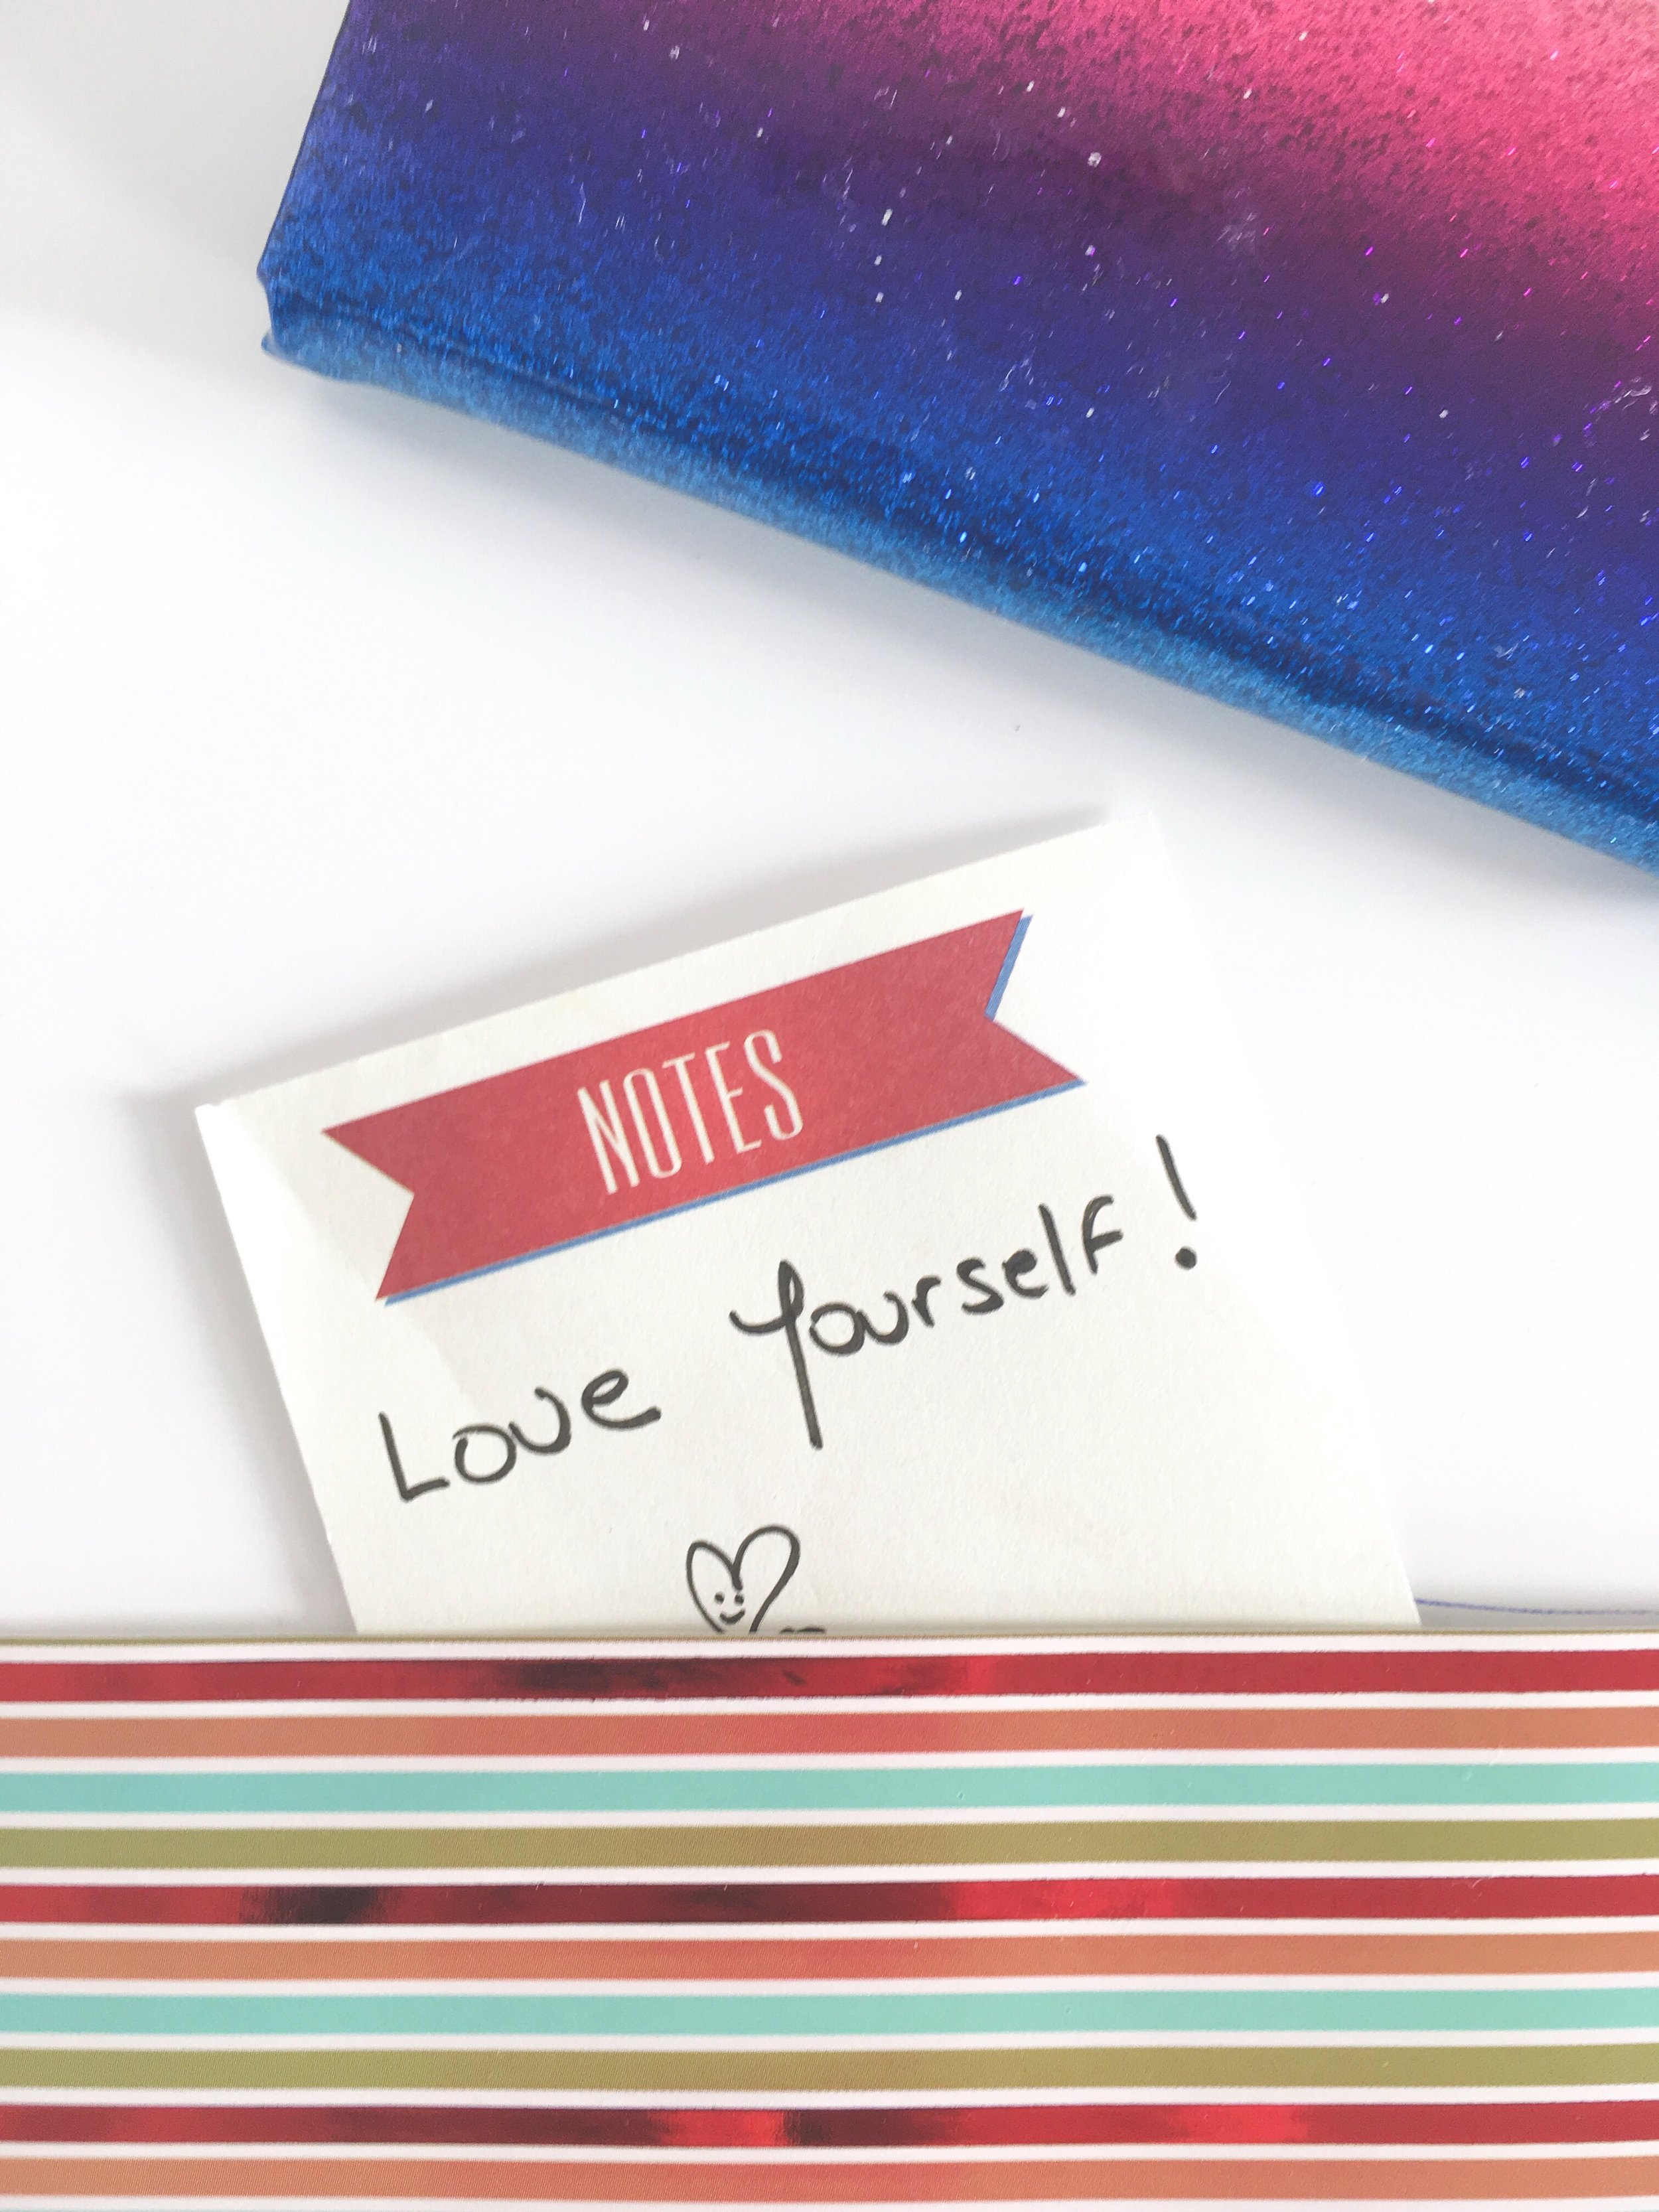 love-yourself_t20_a7lJxn.jpg